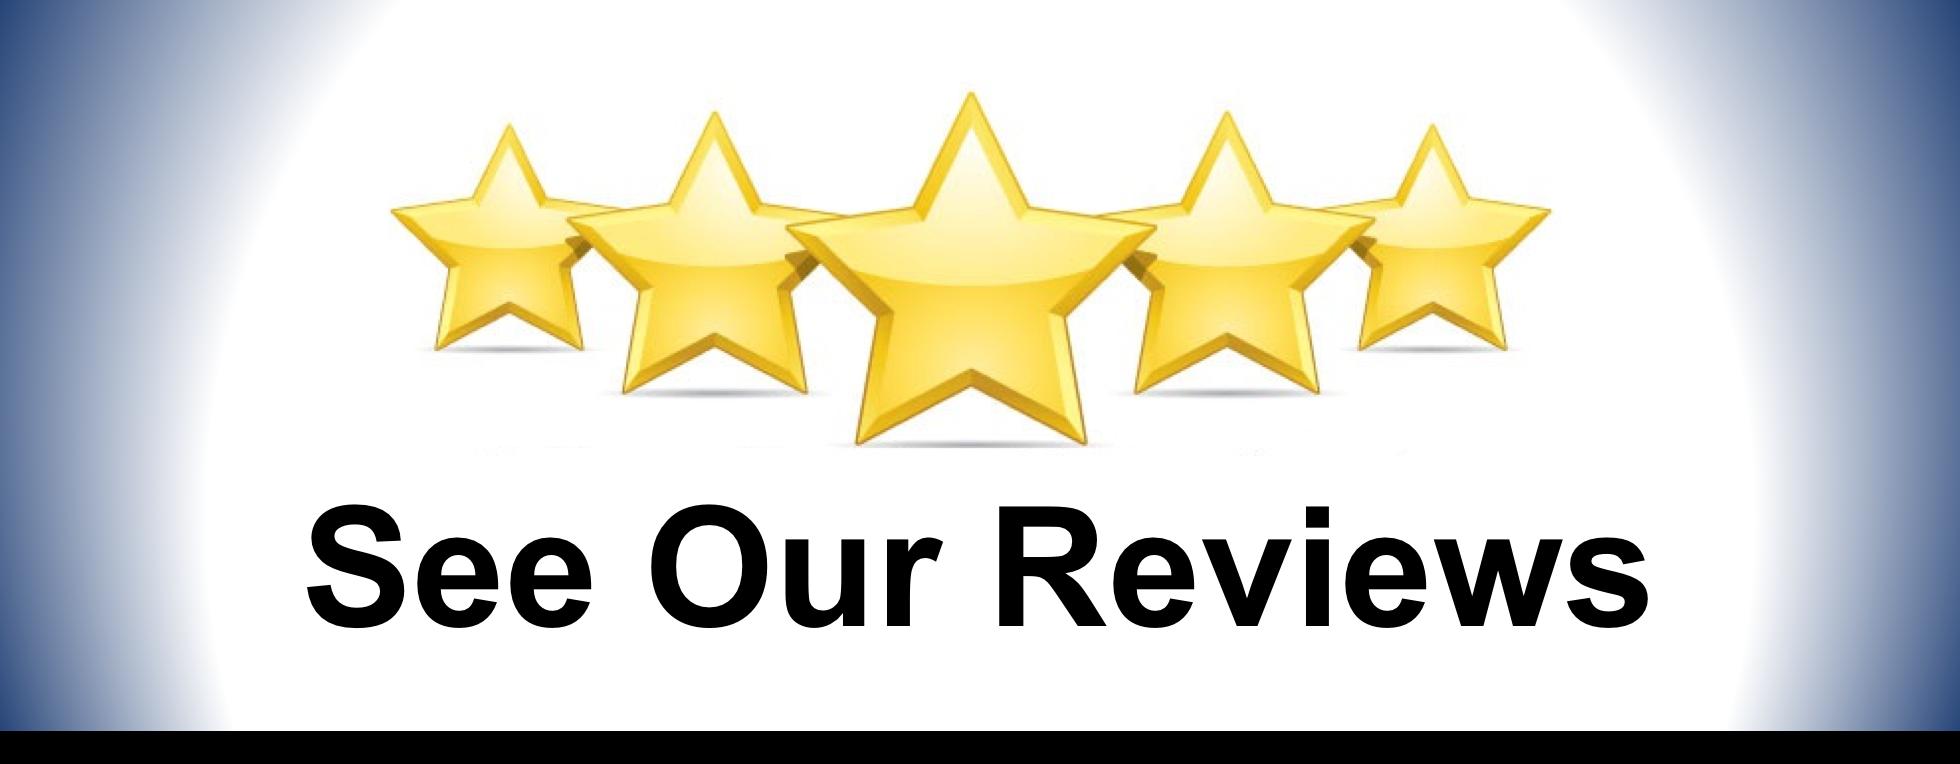 Children's Dentistry & Orthodontics of Lynchburg reviews | Dental Hygienists at 105 Paulette Cir - Lynchburg VA